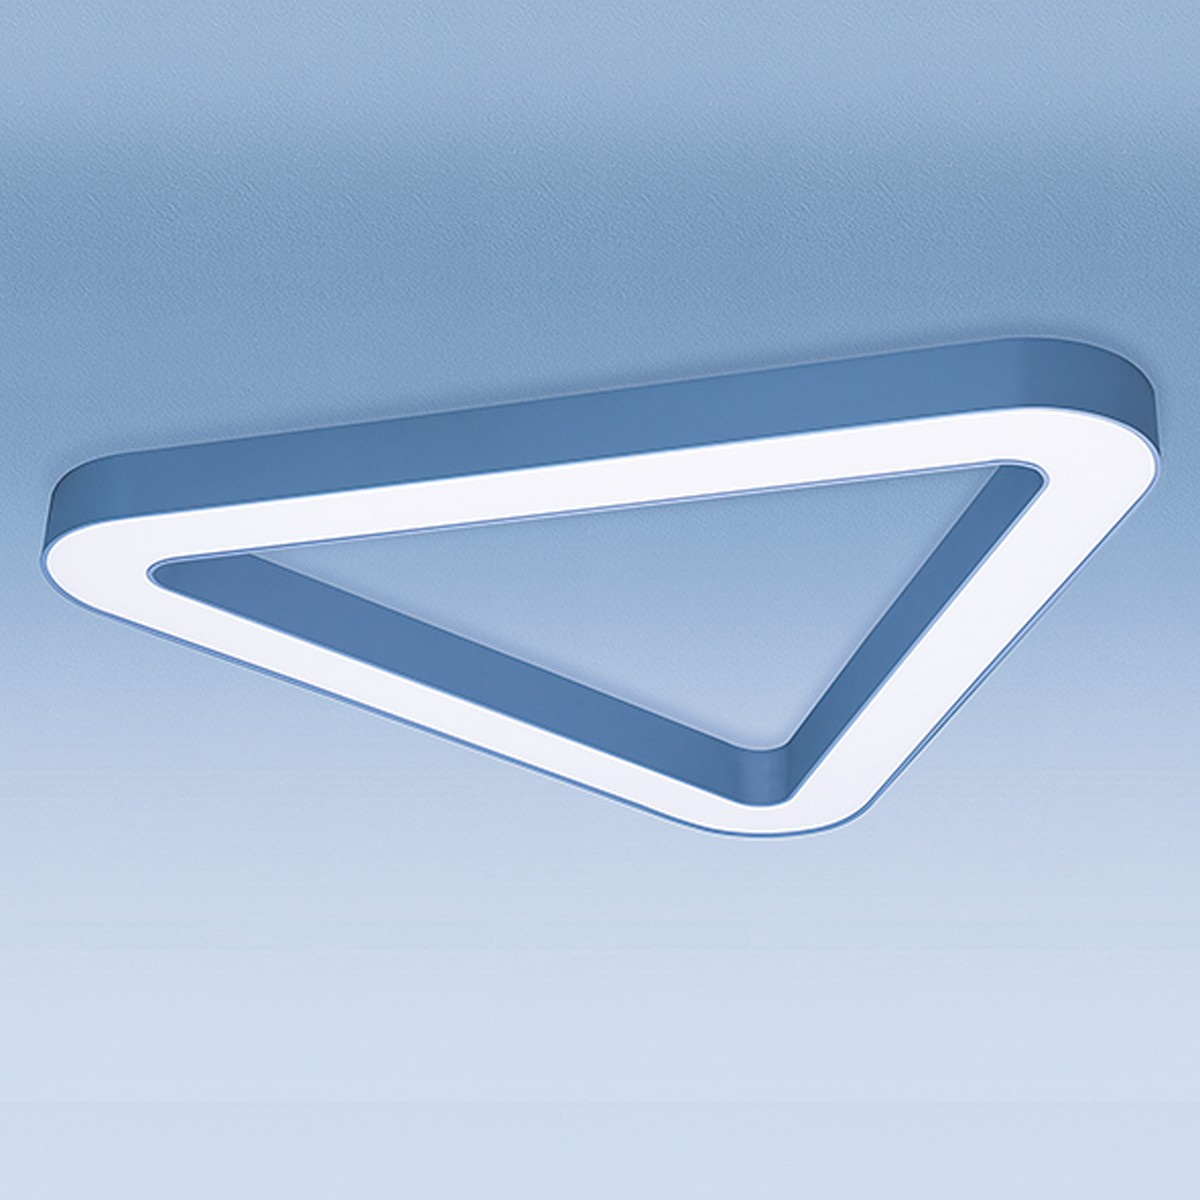 Lightnet Three Peaks-A Deckenleuchte, Länge: 84 cm, Silber matt